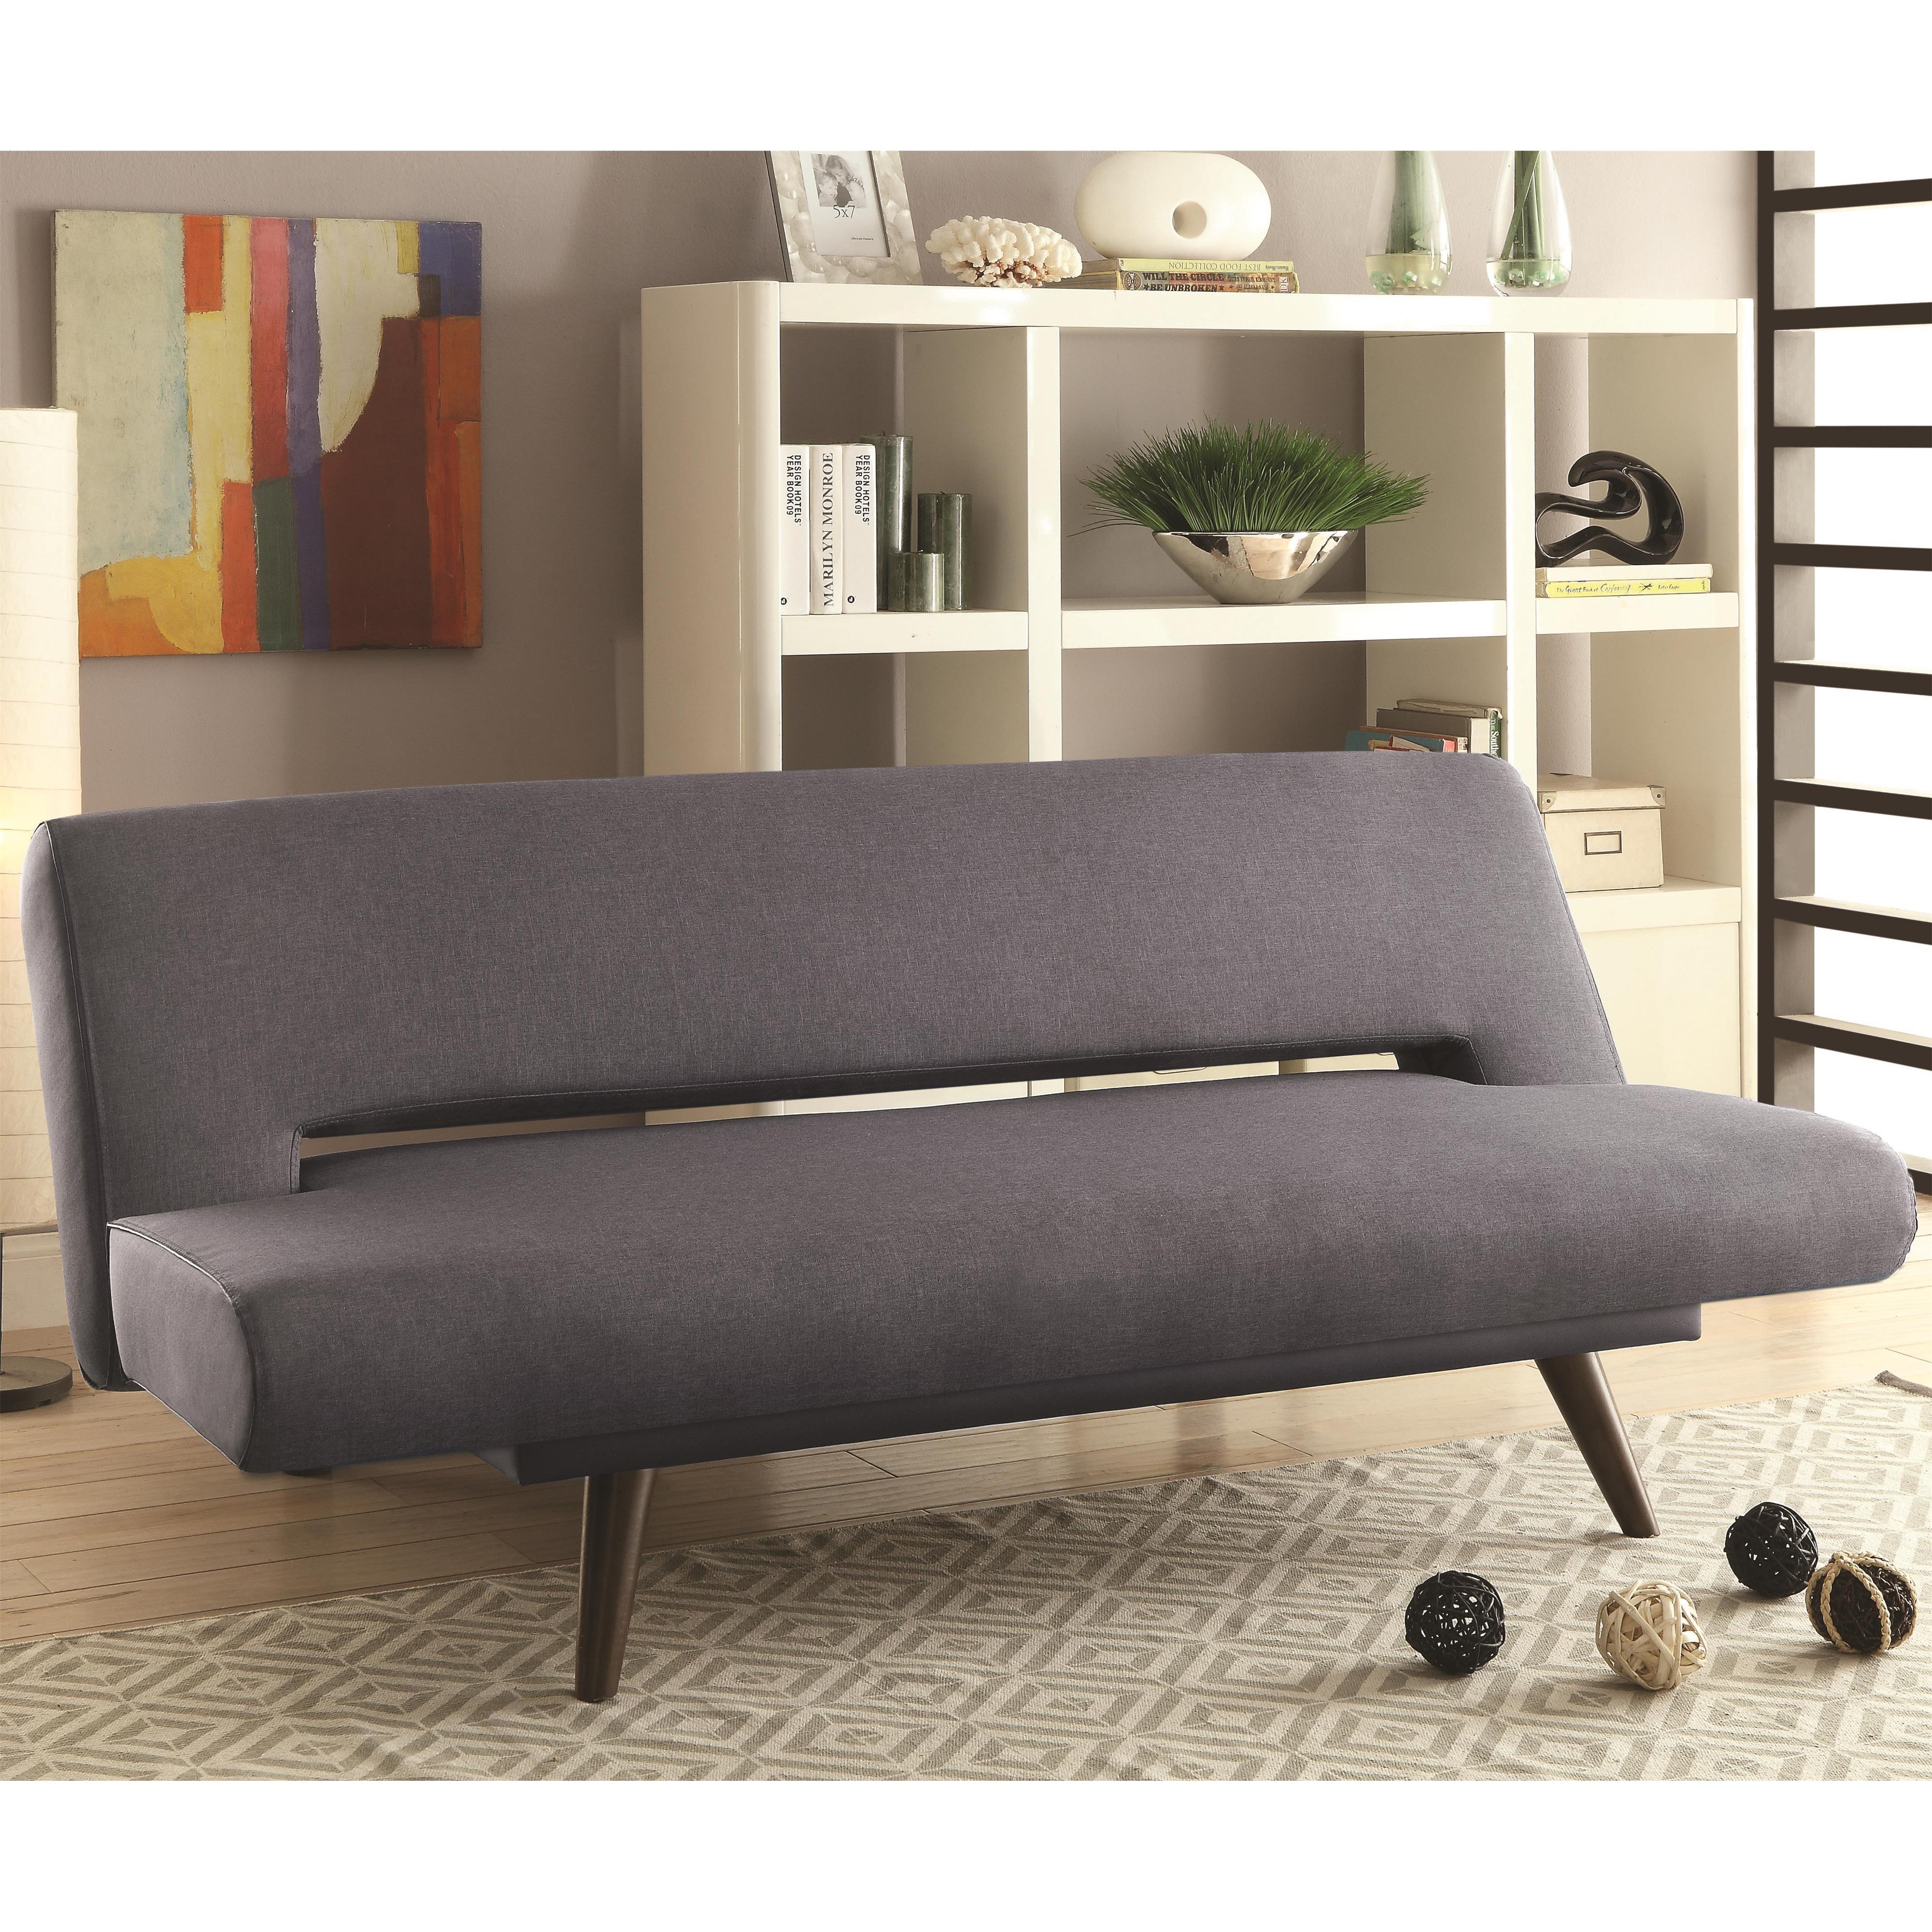 coaster sofa beds and futons mid century modern adjustable. Black Bedroom Furniture Sets. Home Design Ideas